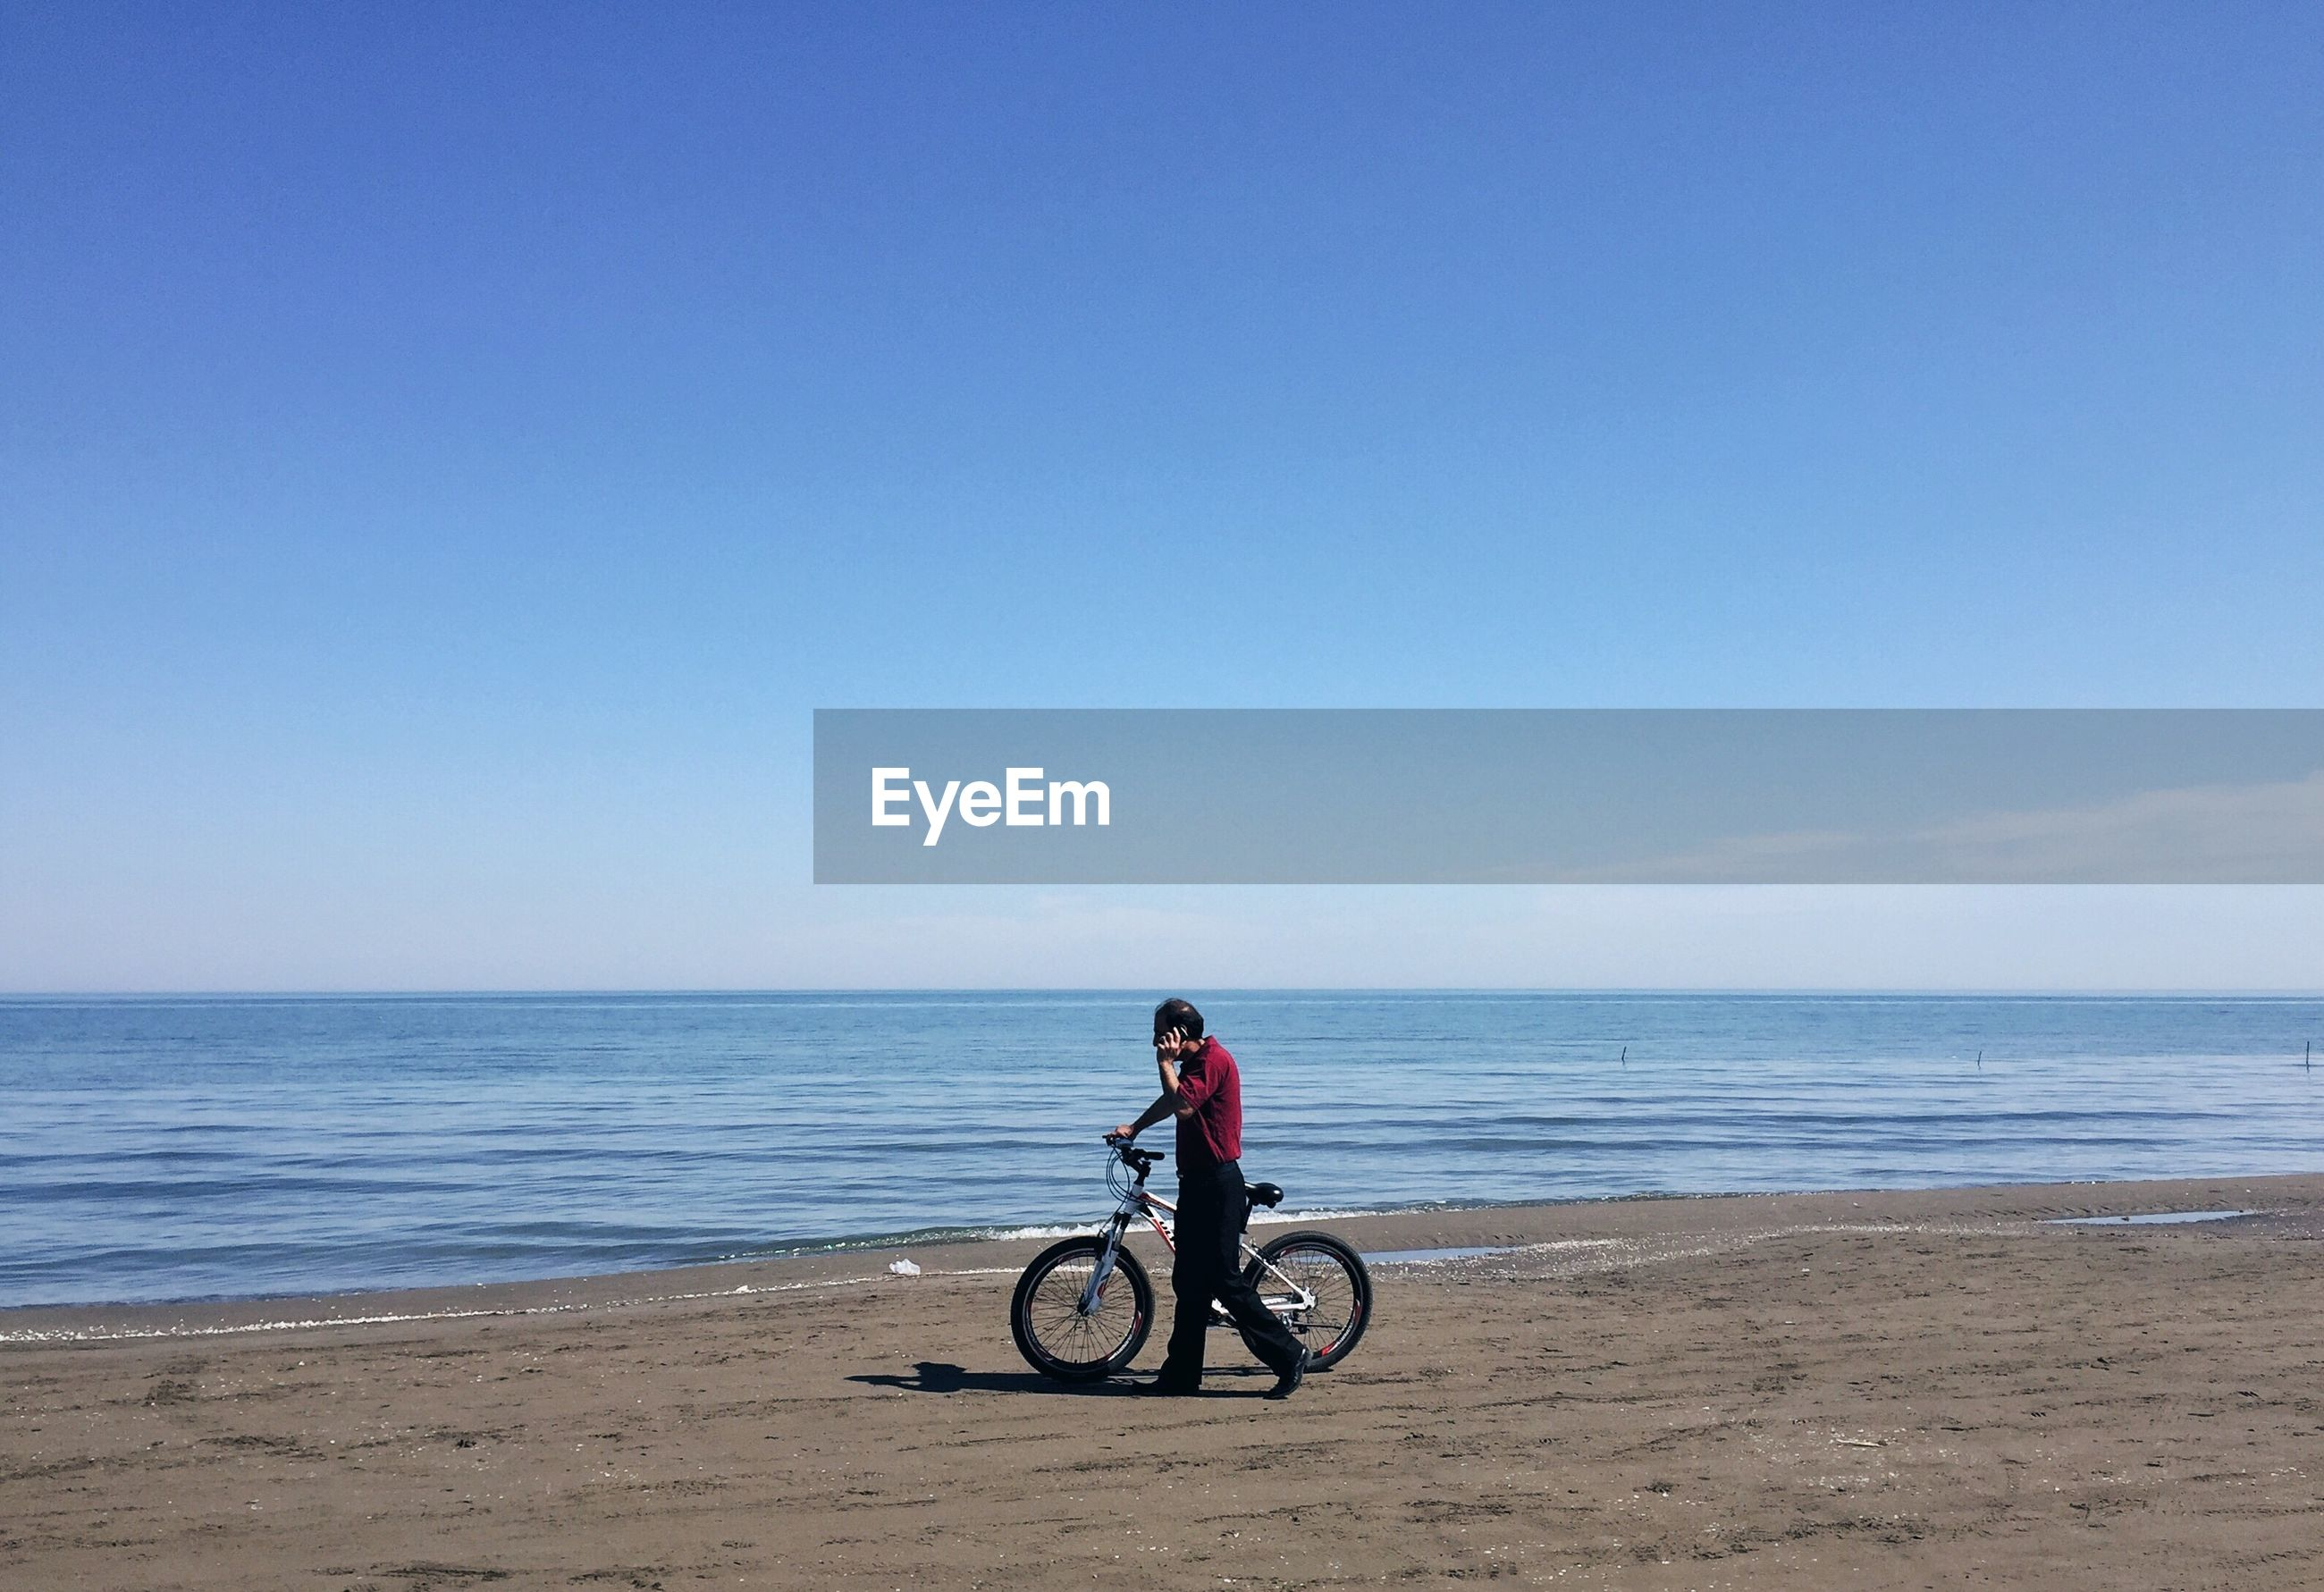 MAN RIDING BICYCLE ON BEACH